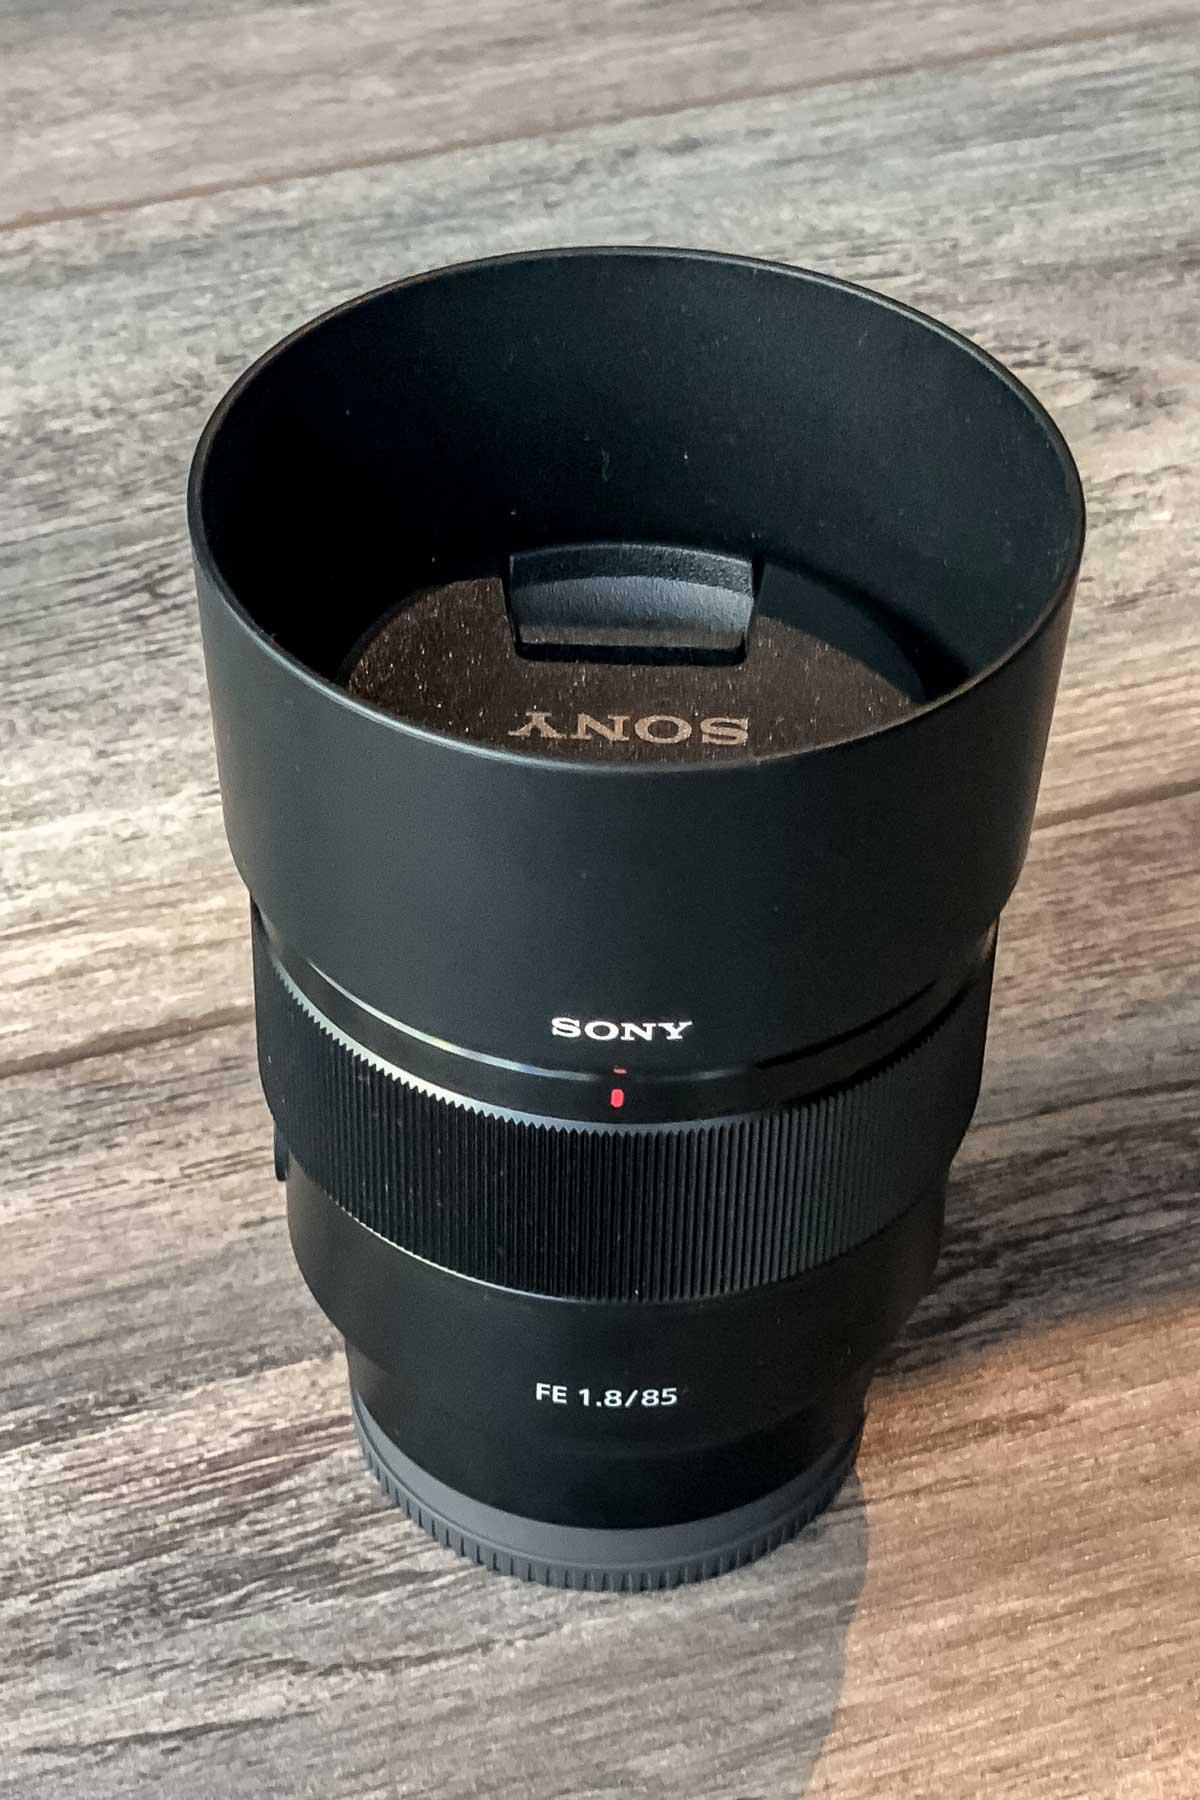 Sony 85mm f1.8 portrait lens